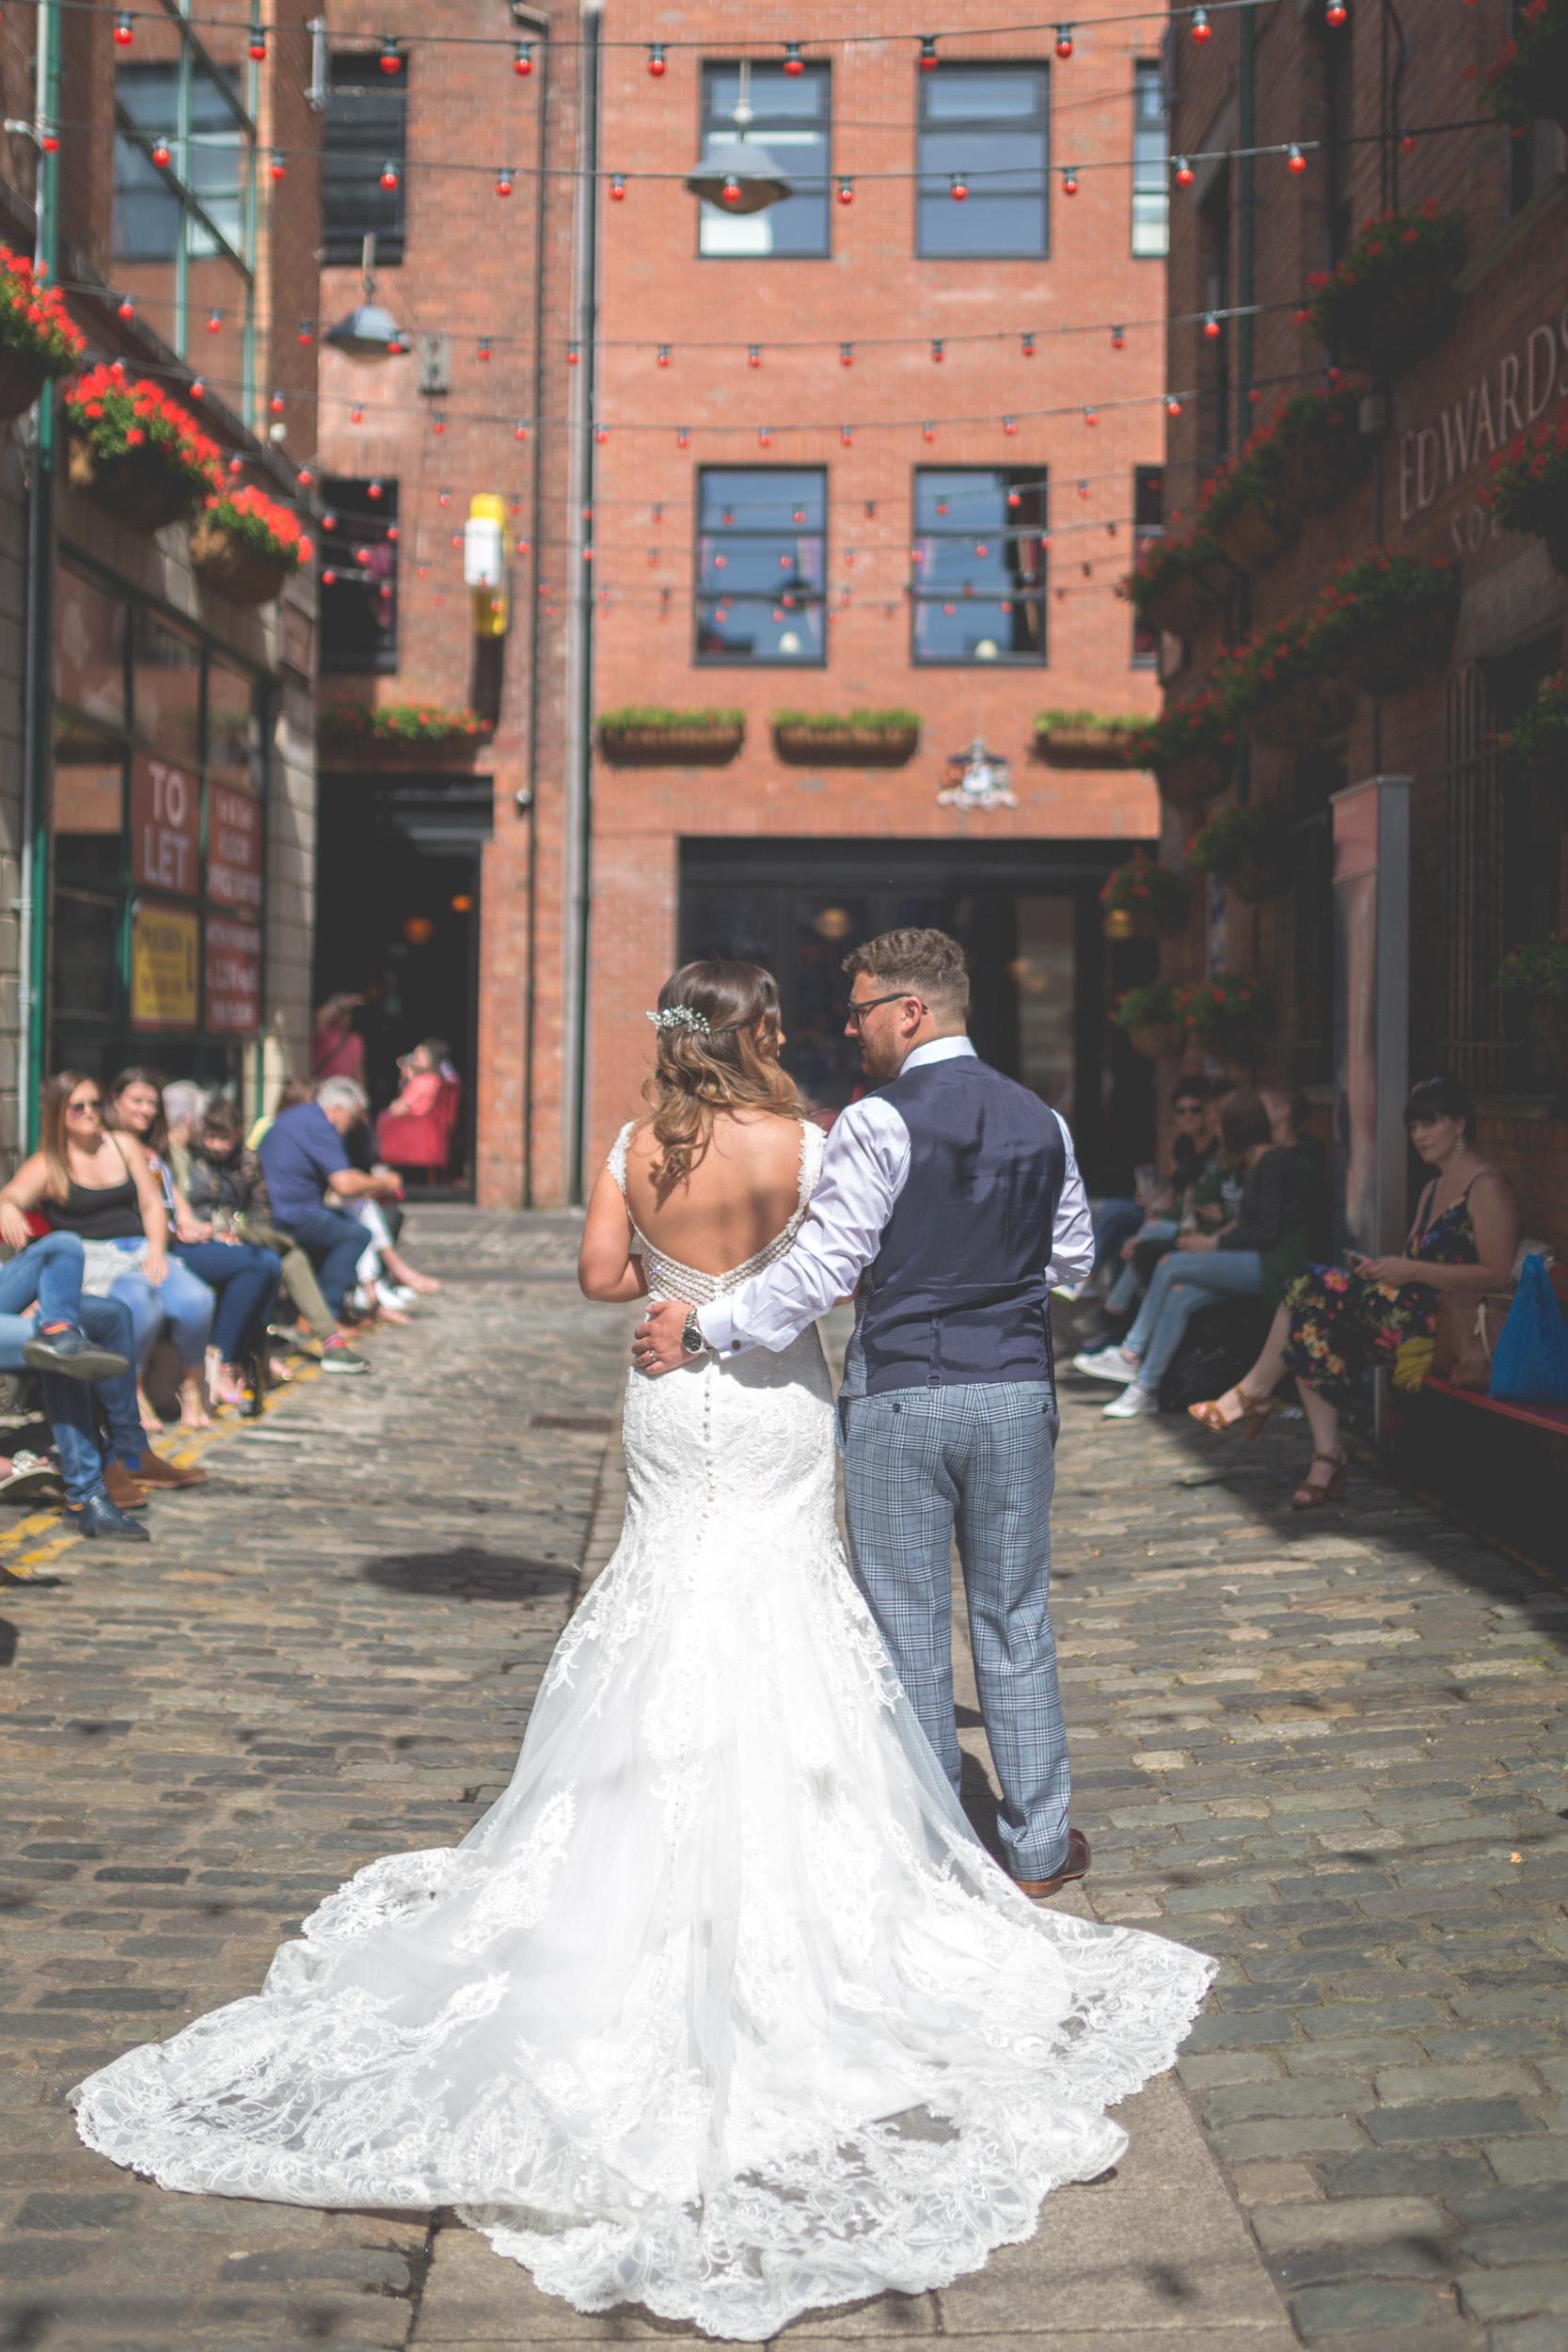 Brian McEwan   Northern Ireland Wedding Photographer   Rebecca & Michael   Portraits-115.jpg